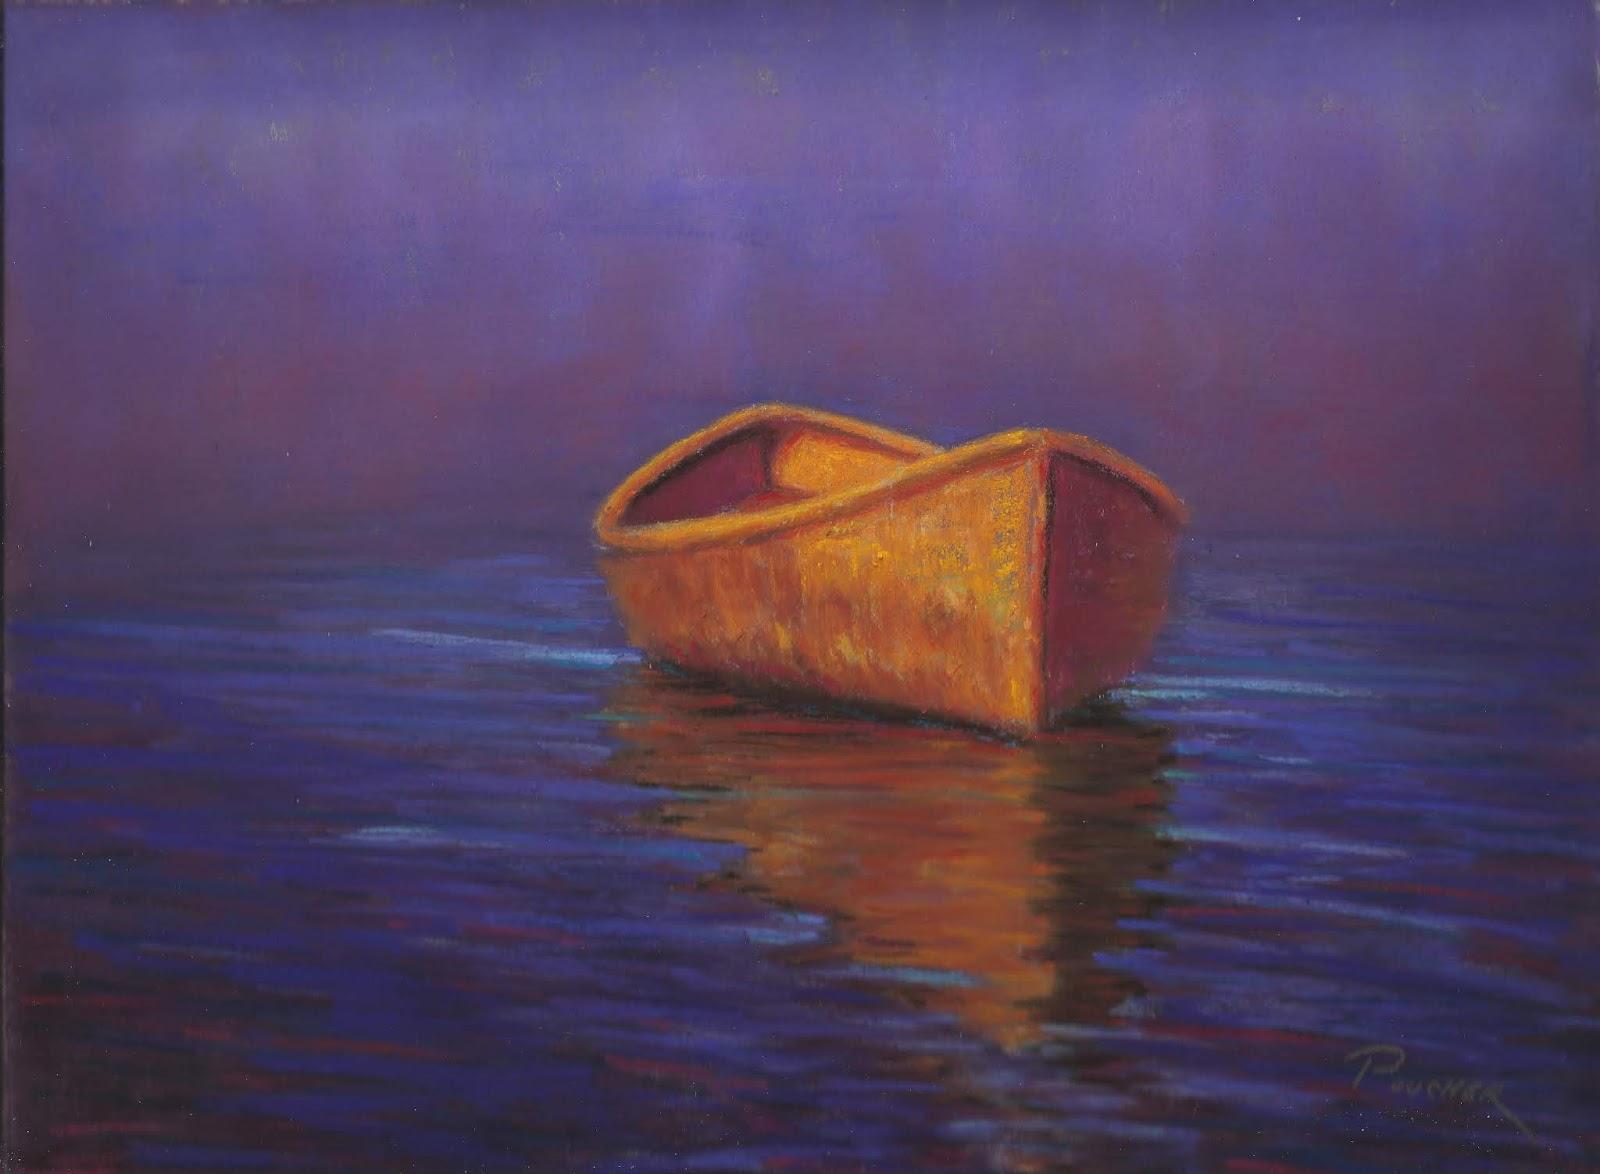 Adrift Boat Seascape Pastel Painting By Poucher